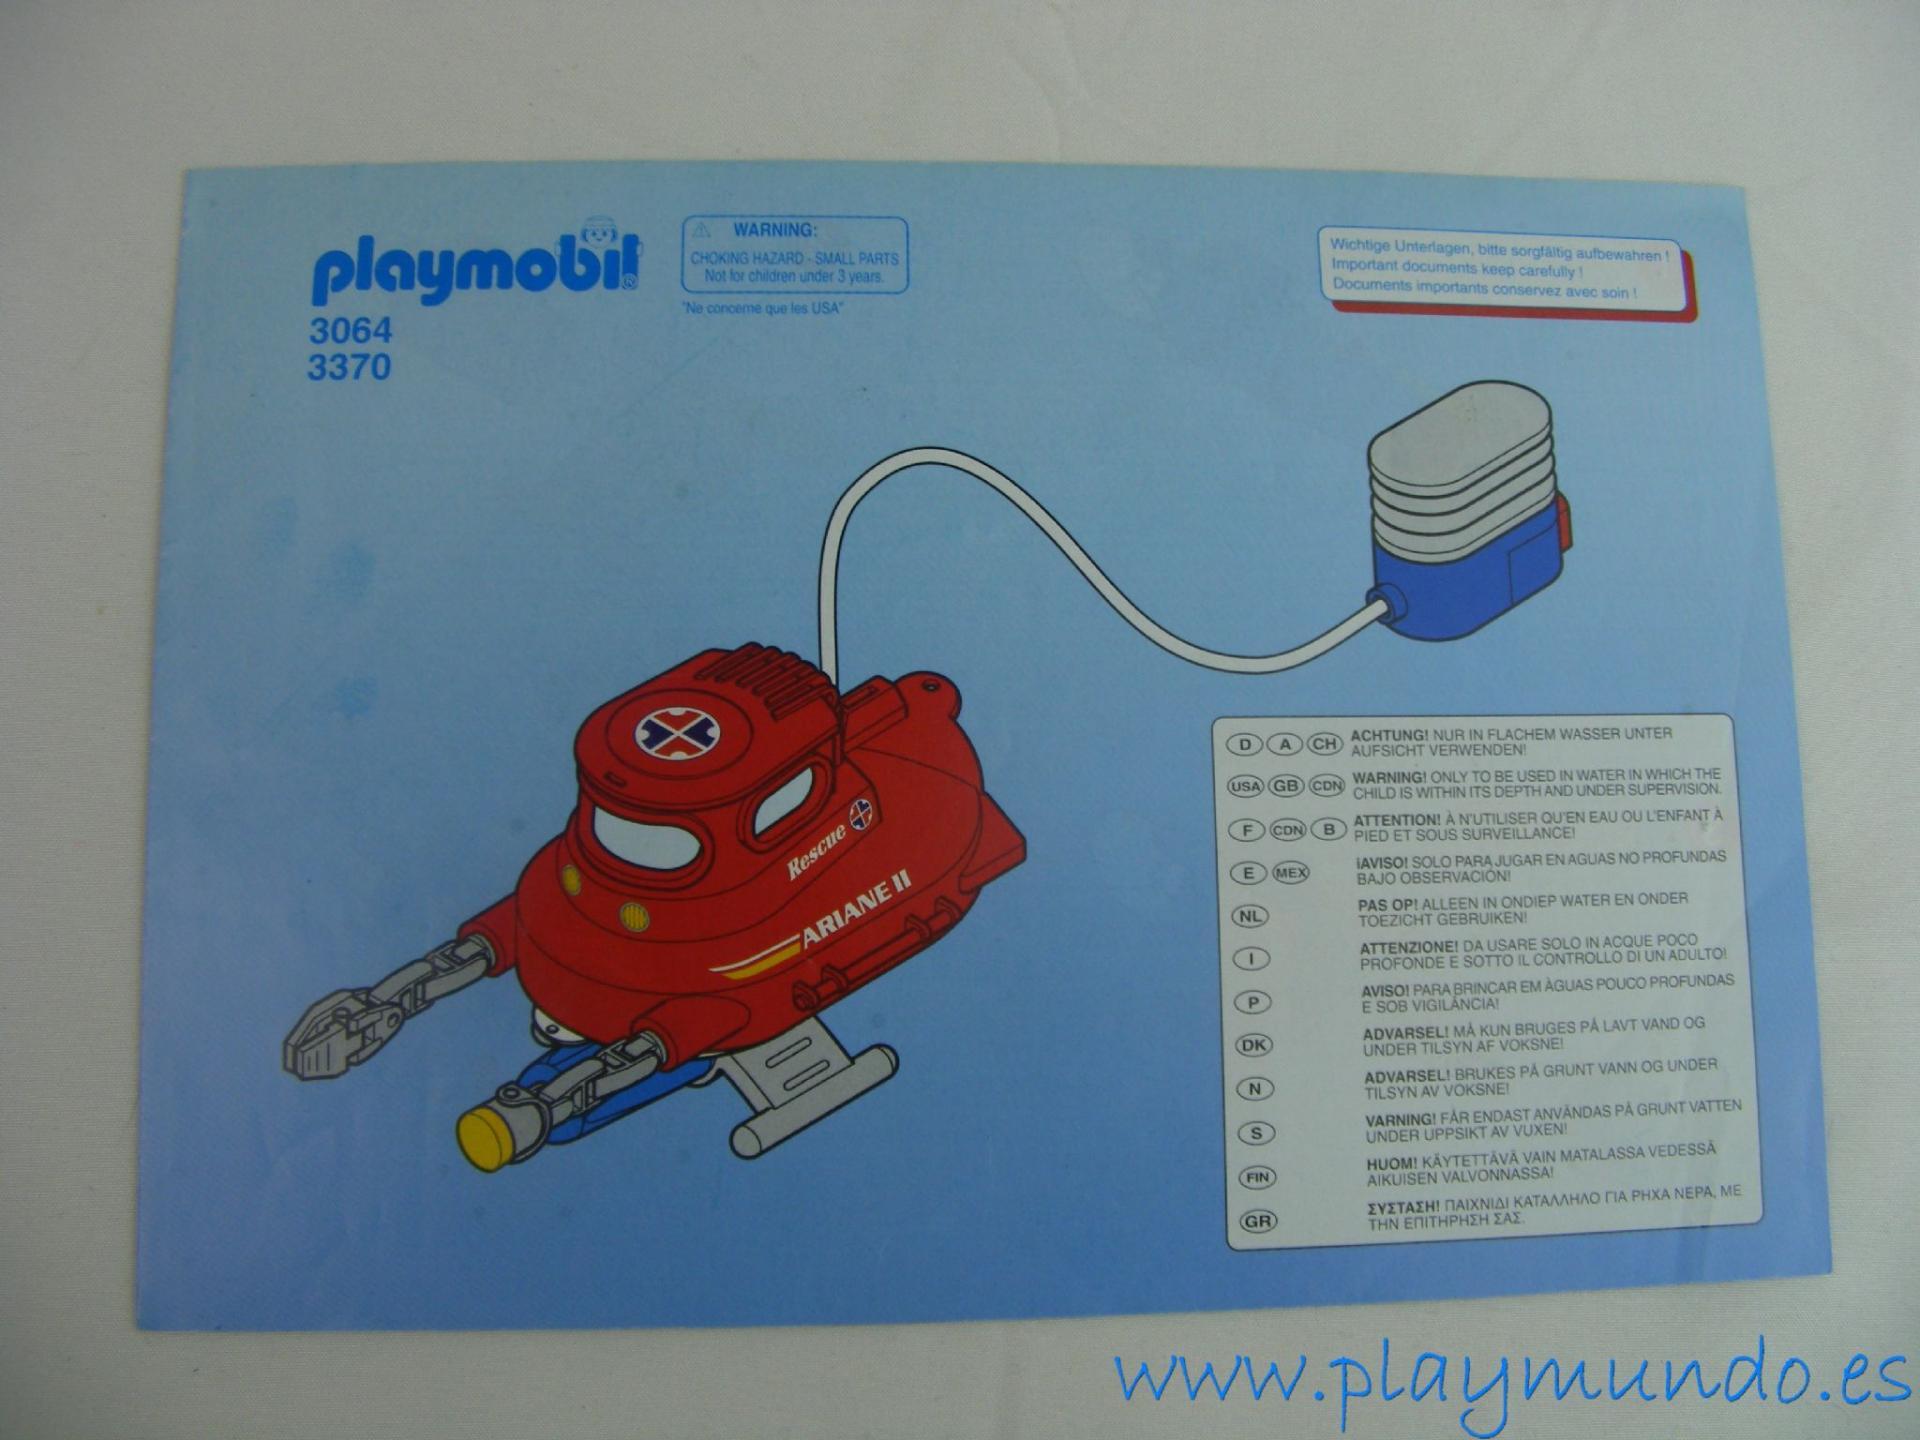 PLAYMOBIL MANUAL MINI SUBMARINO REF. 3064